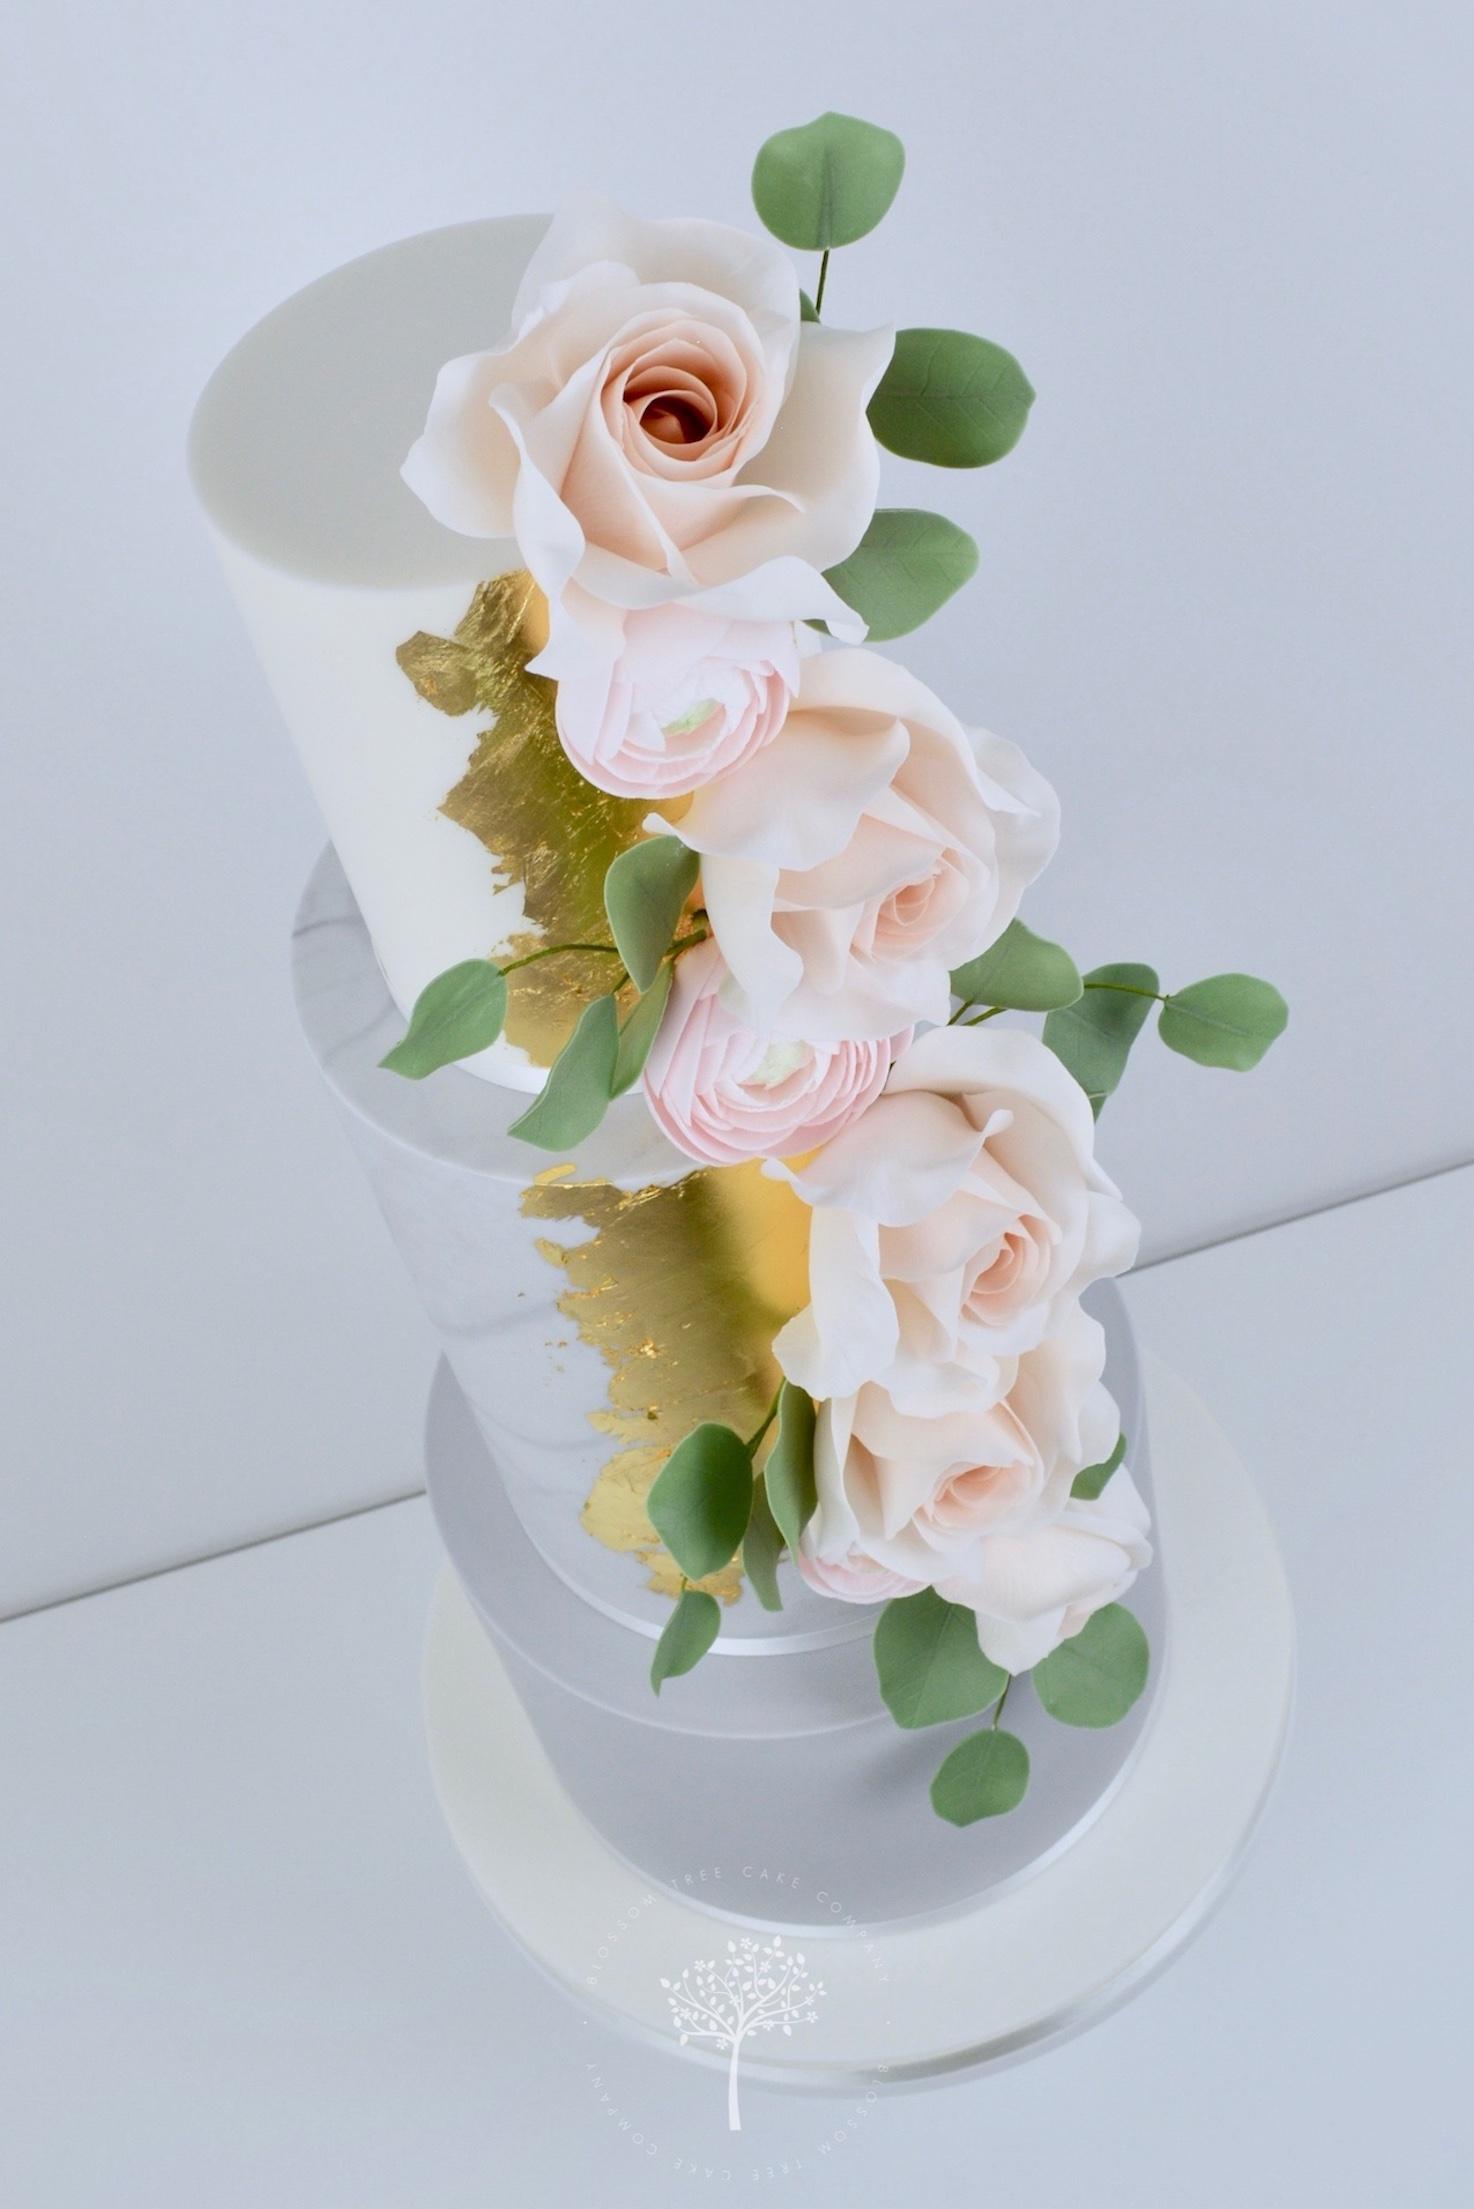 Rose Gold and Ranunculus wedding cake by Blossom Tree Cake Company Harrogate North Yorkshire - angle.jpg